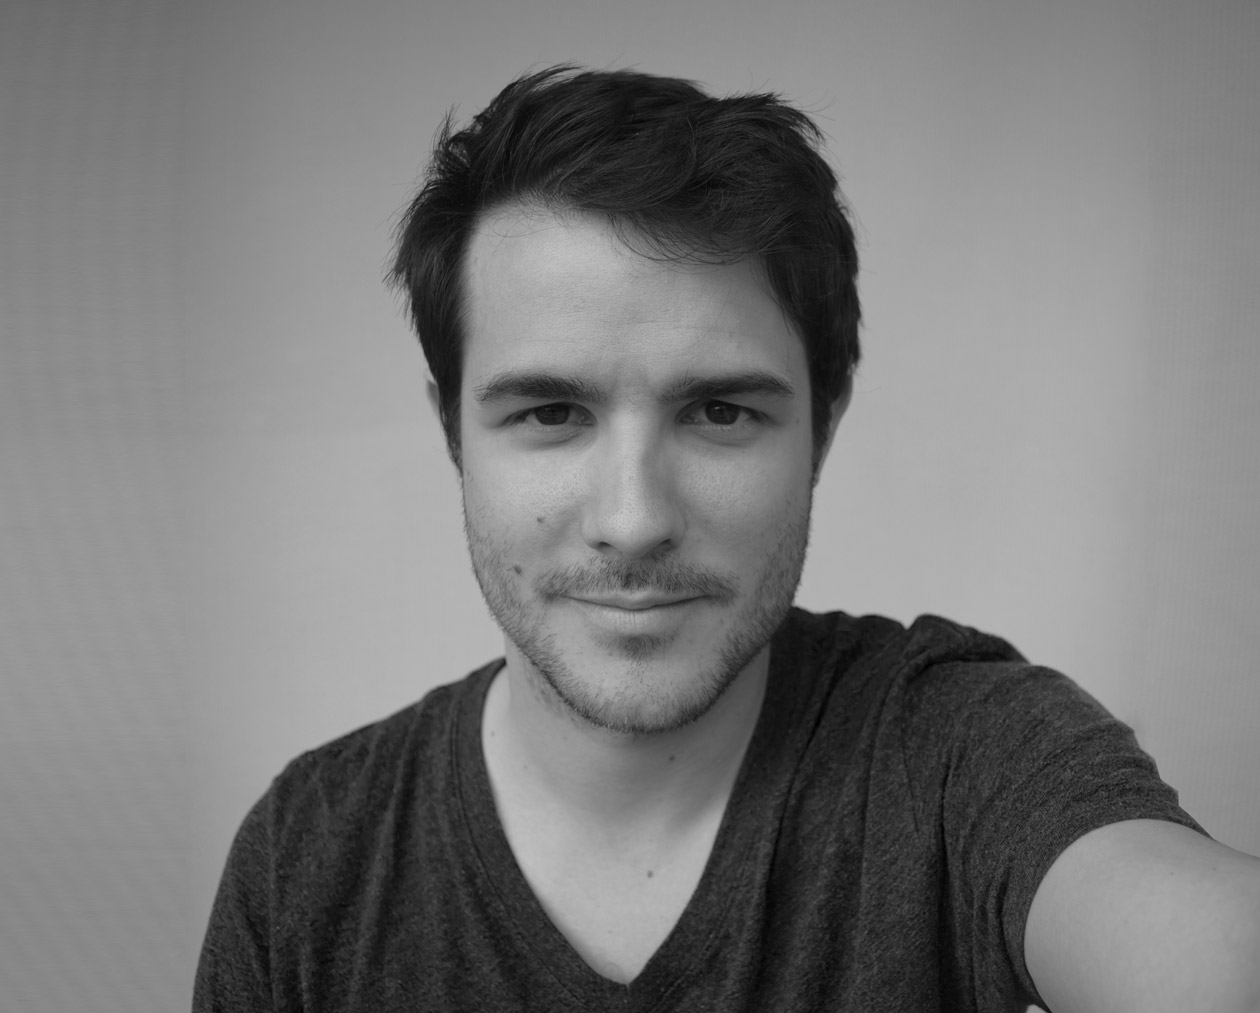 Selfie Olivier Gatelmand Portrait